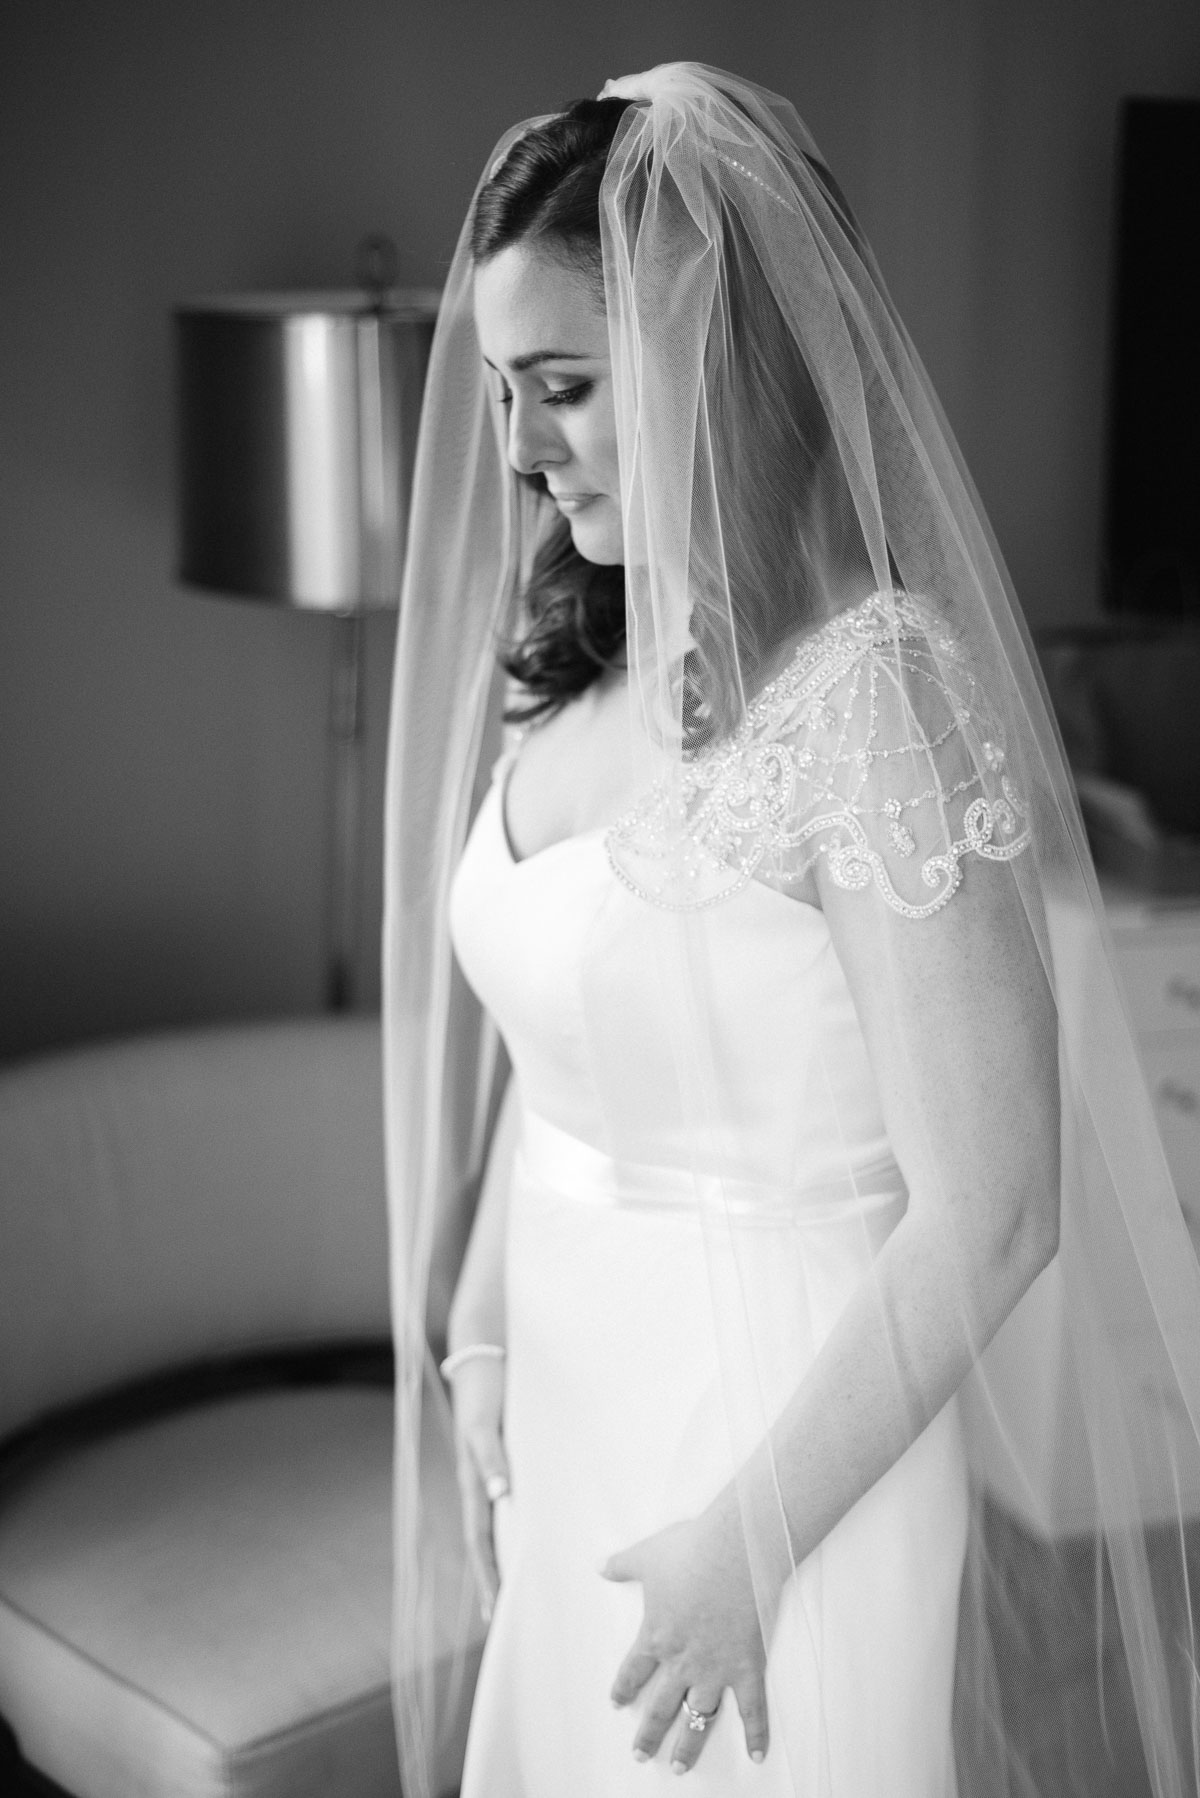 Pamela Yasuko Photography - A New Leaf Wedding - Chicago Oahu Photographer-7.jpg